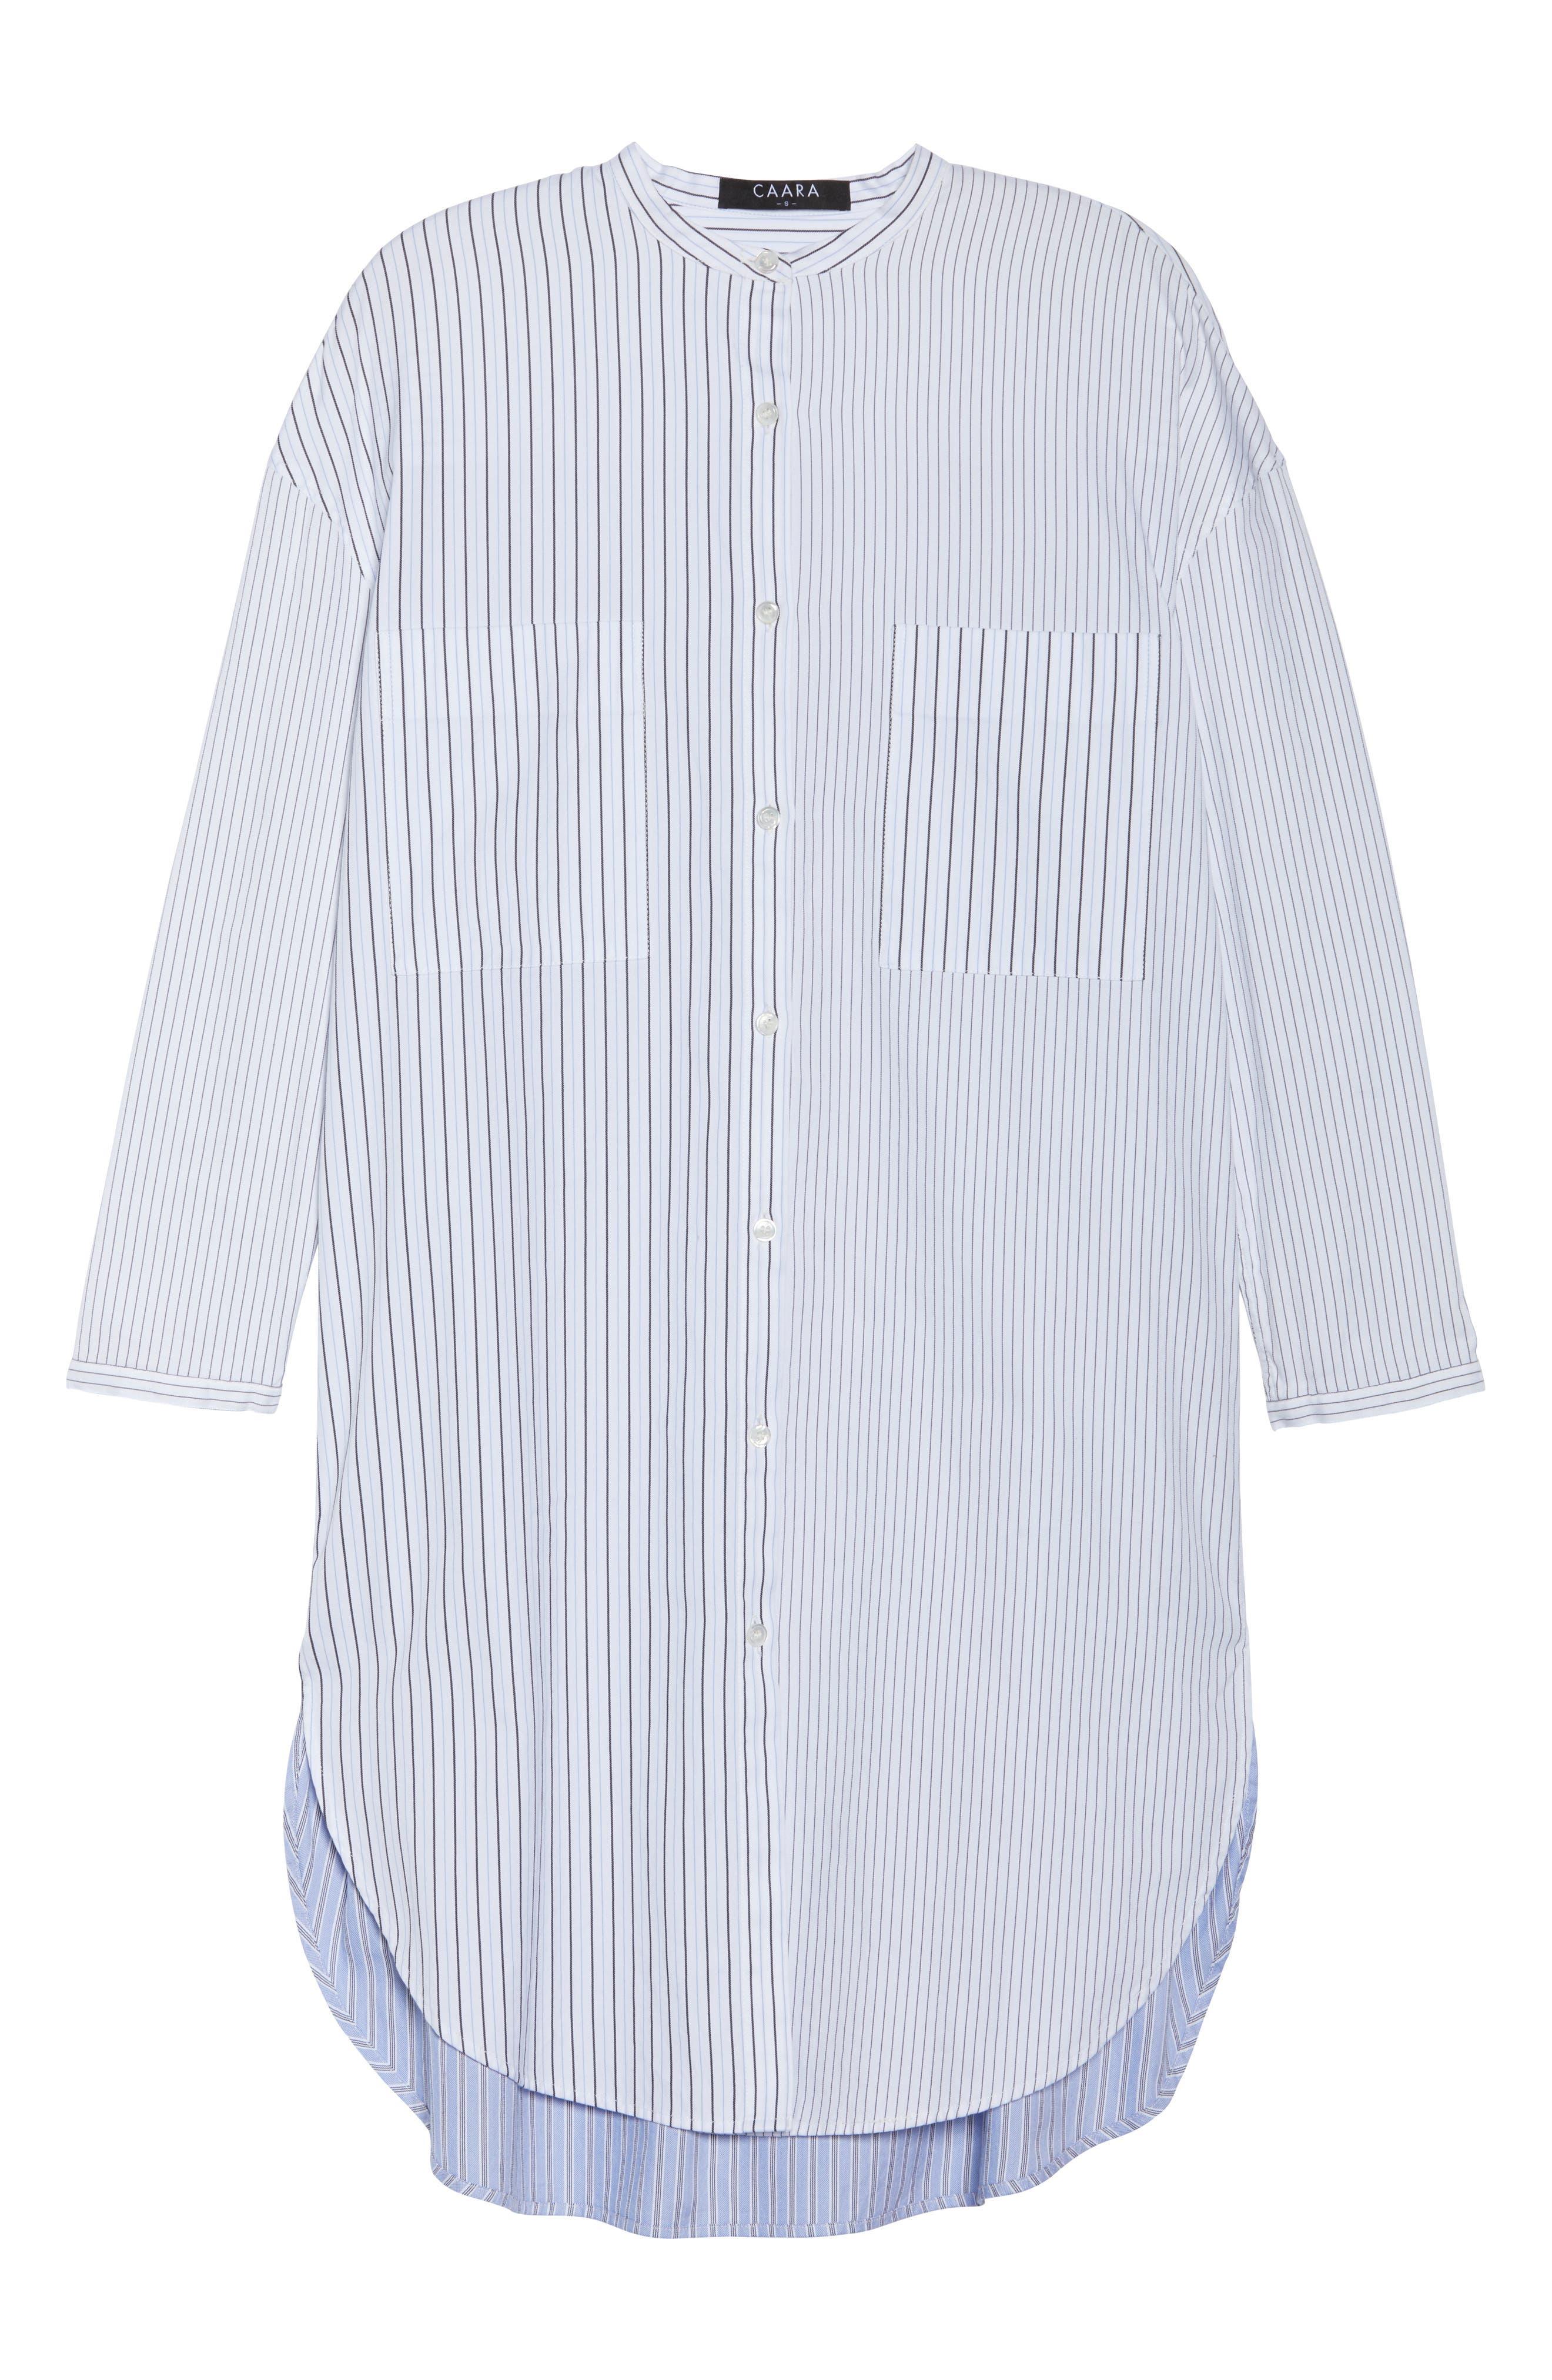 Tia Stripe Shirtdress,                             Alternate thumbnail 6, color,                             Stripe